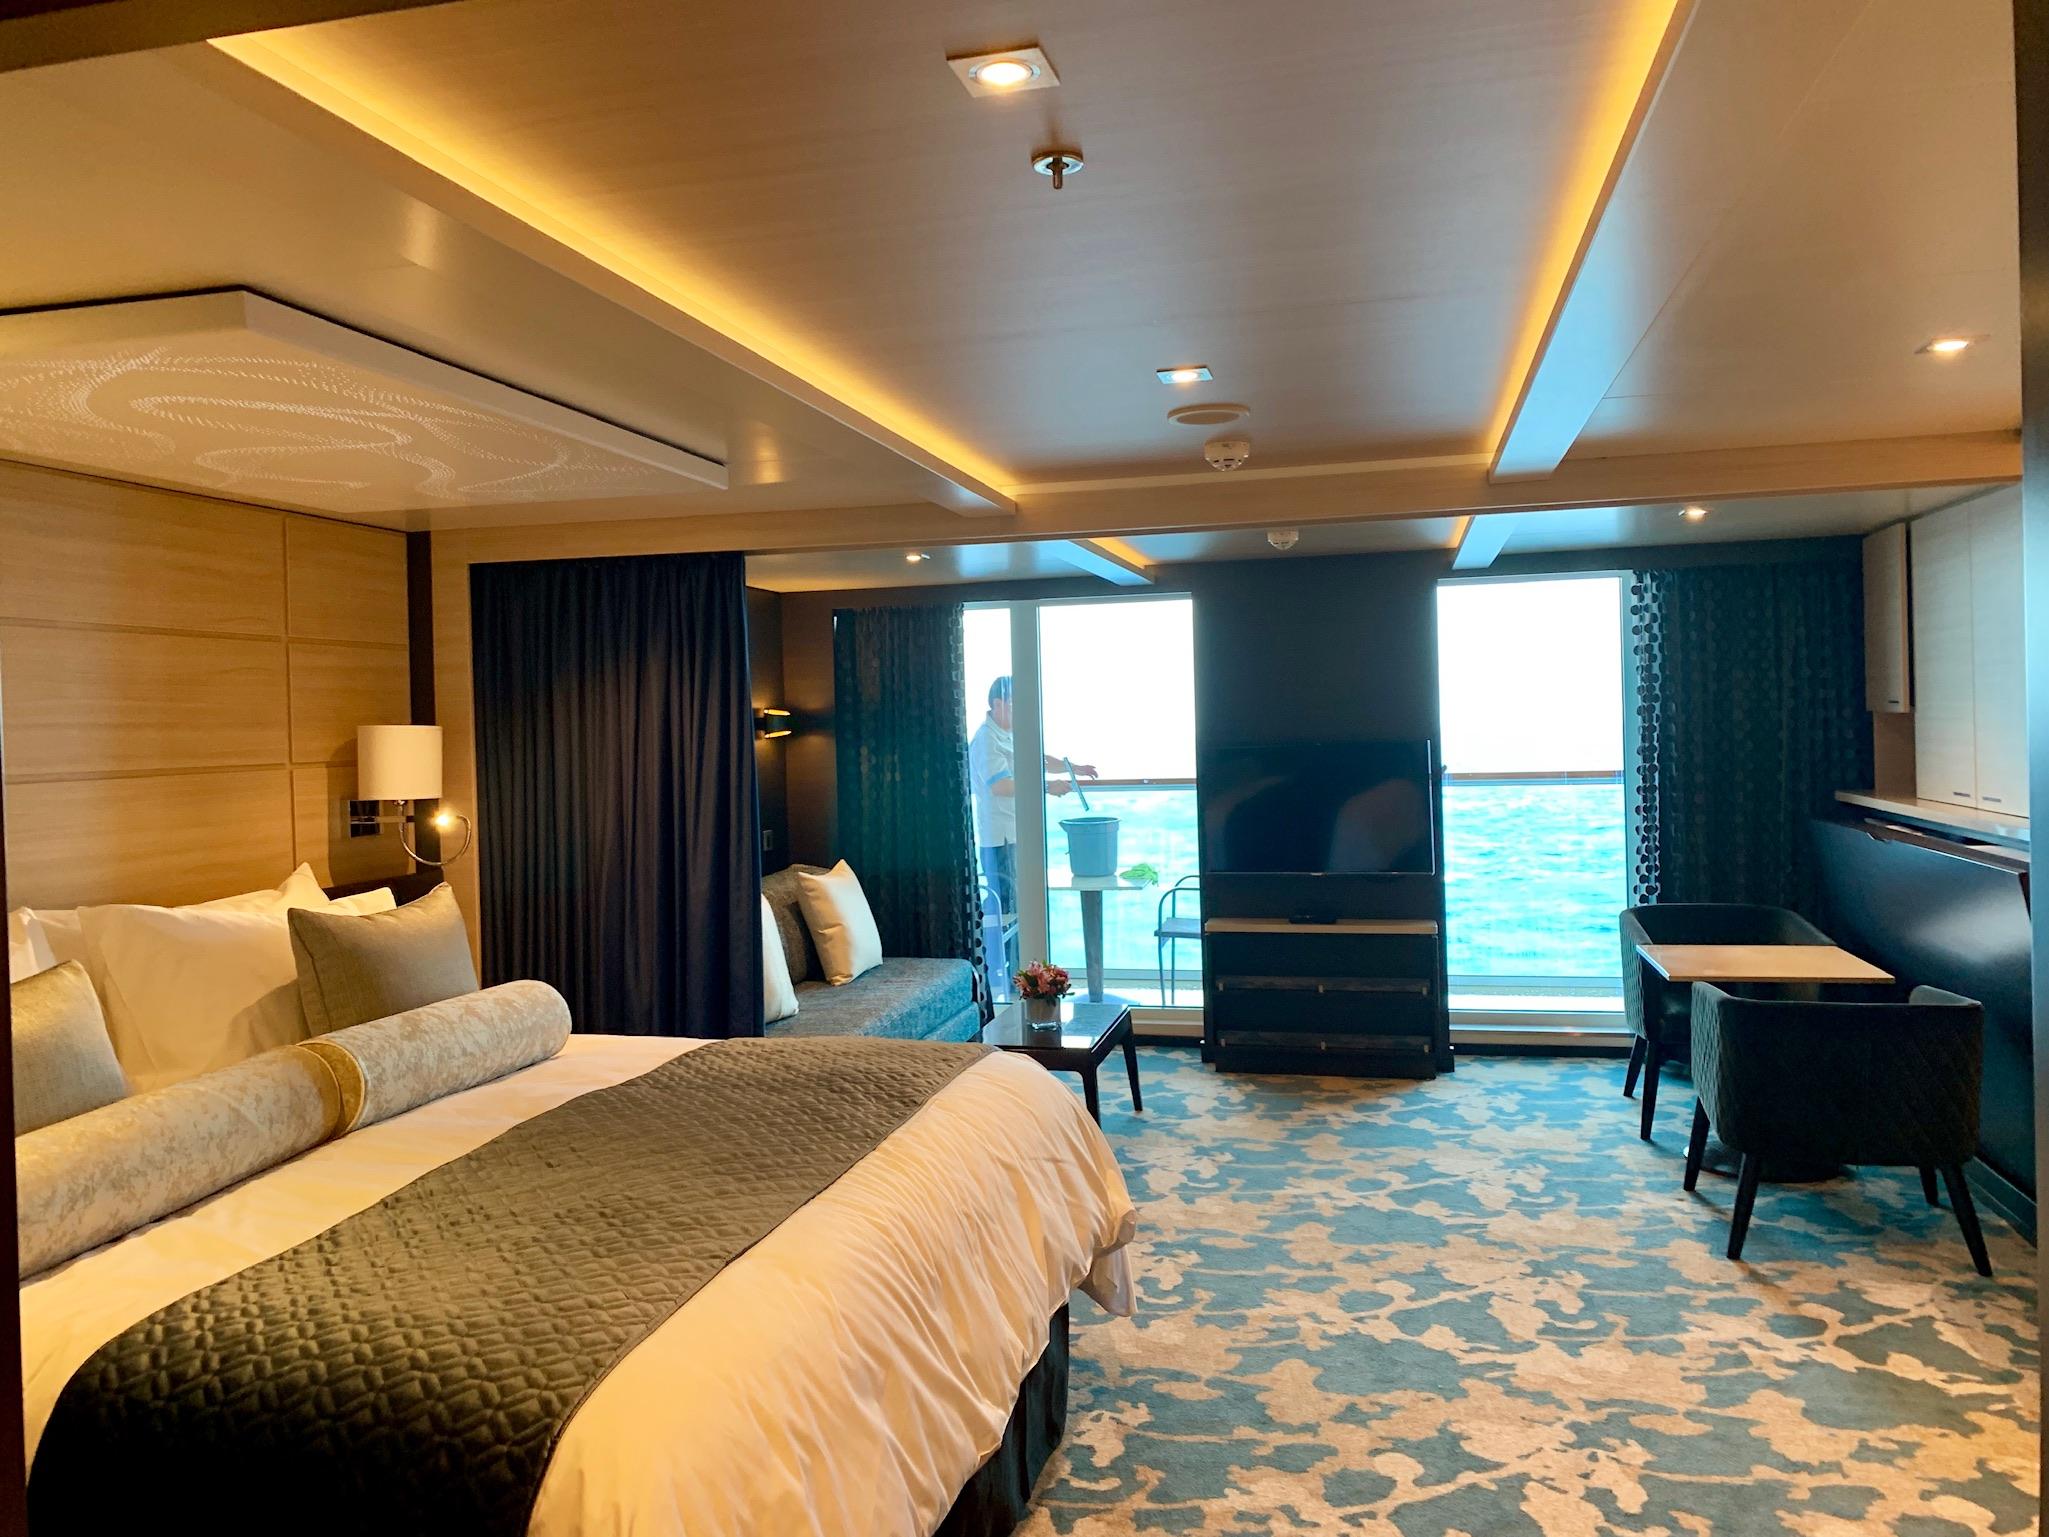 NCL Joy - Rooms - Haven Family Villa Suite Overview.jpg